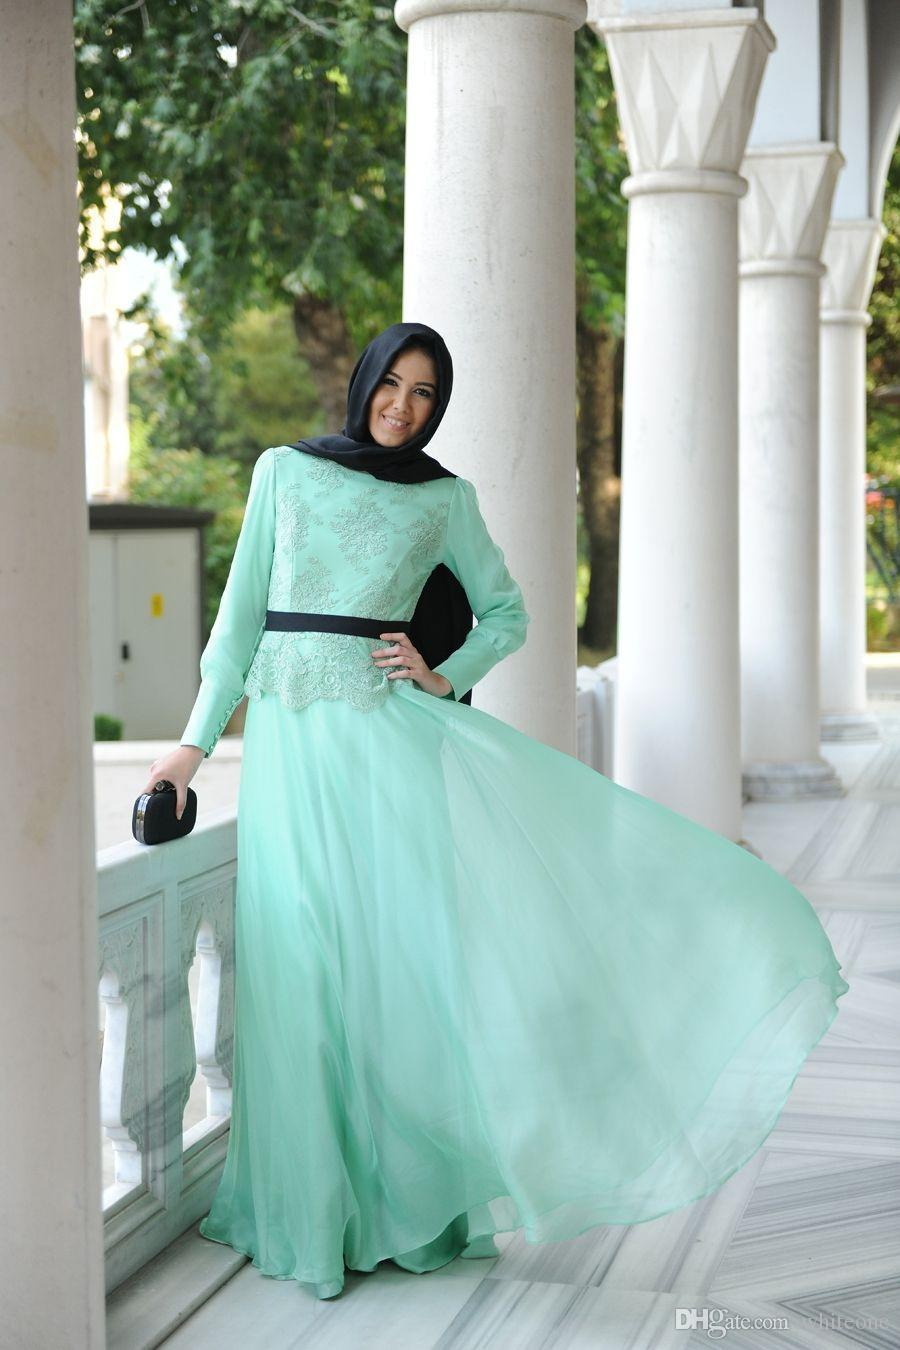 Fine Muslims Wedding Dresses Crest - All Wedding Dresses ...